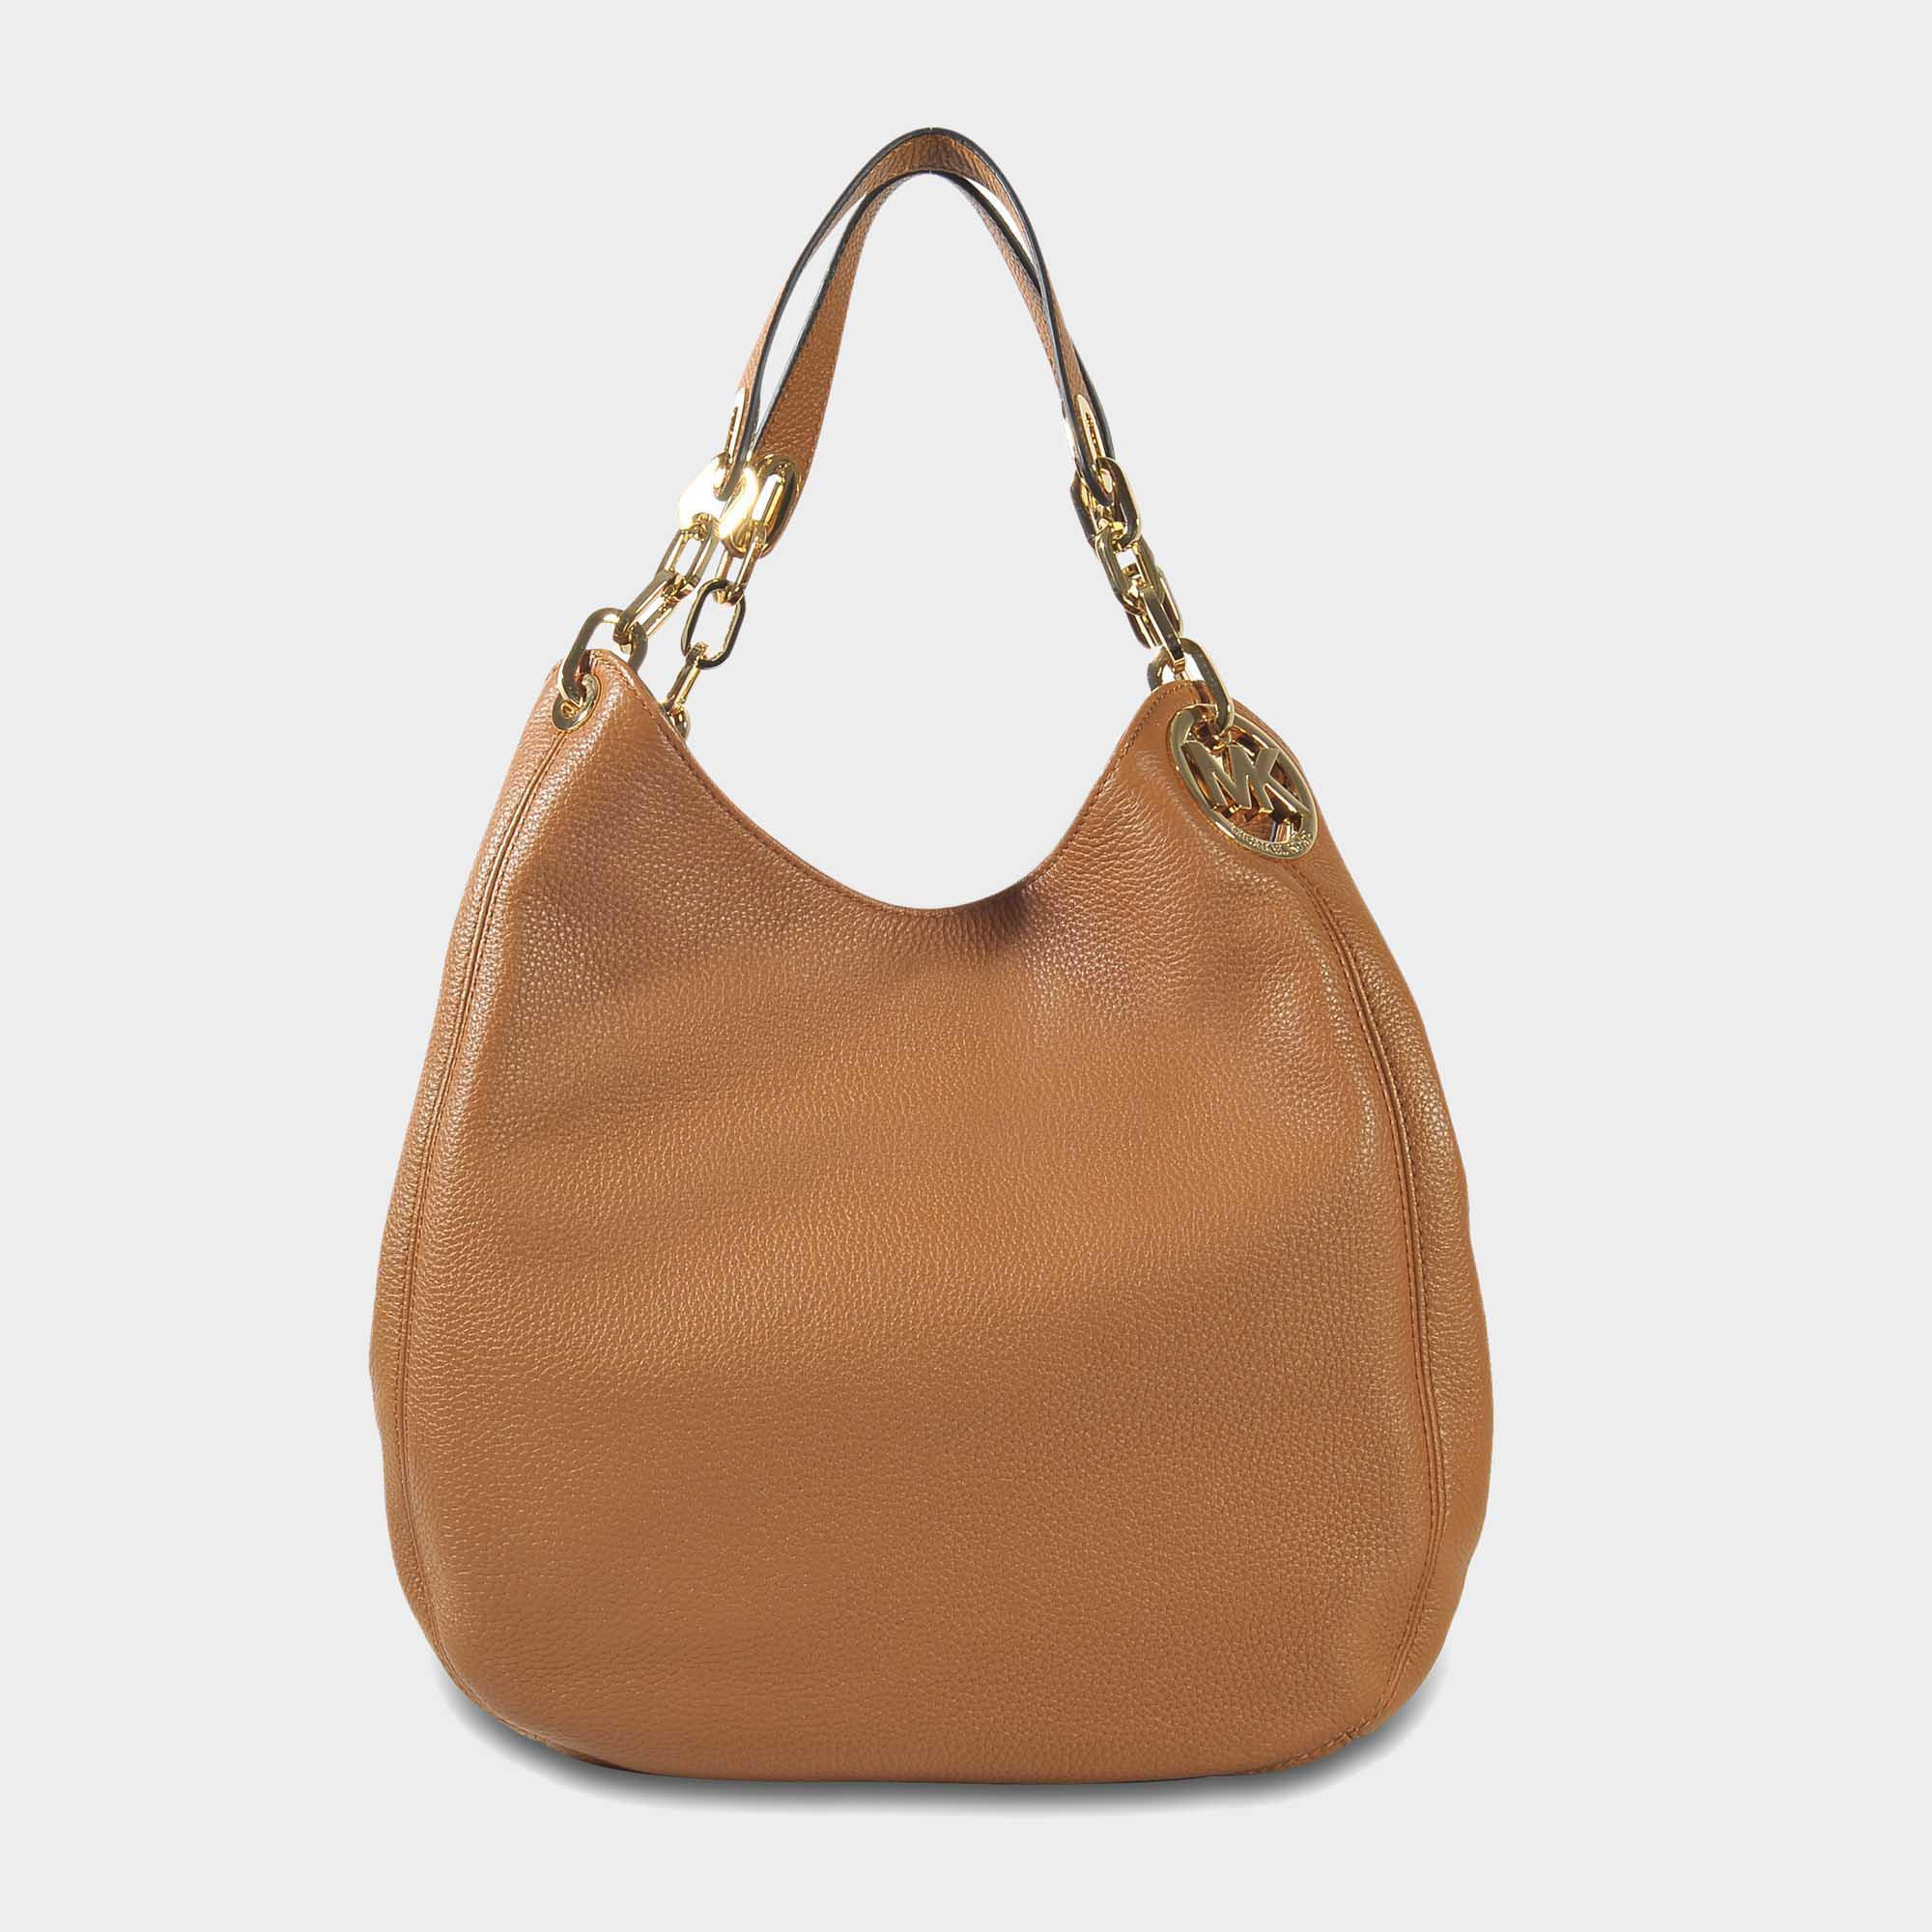 eb3397e15b46 Lyst - MICHAEL Michael Kors Fulton Large Shoulder Tote Bag In Acorn ...